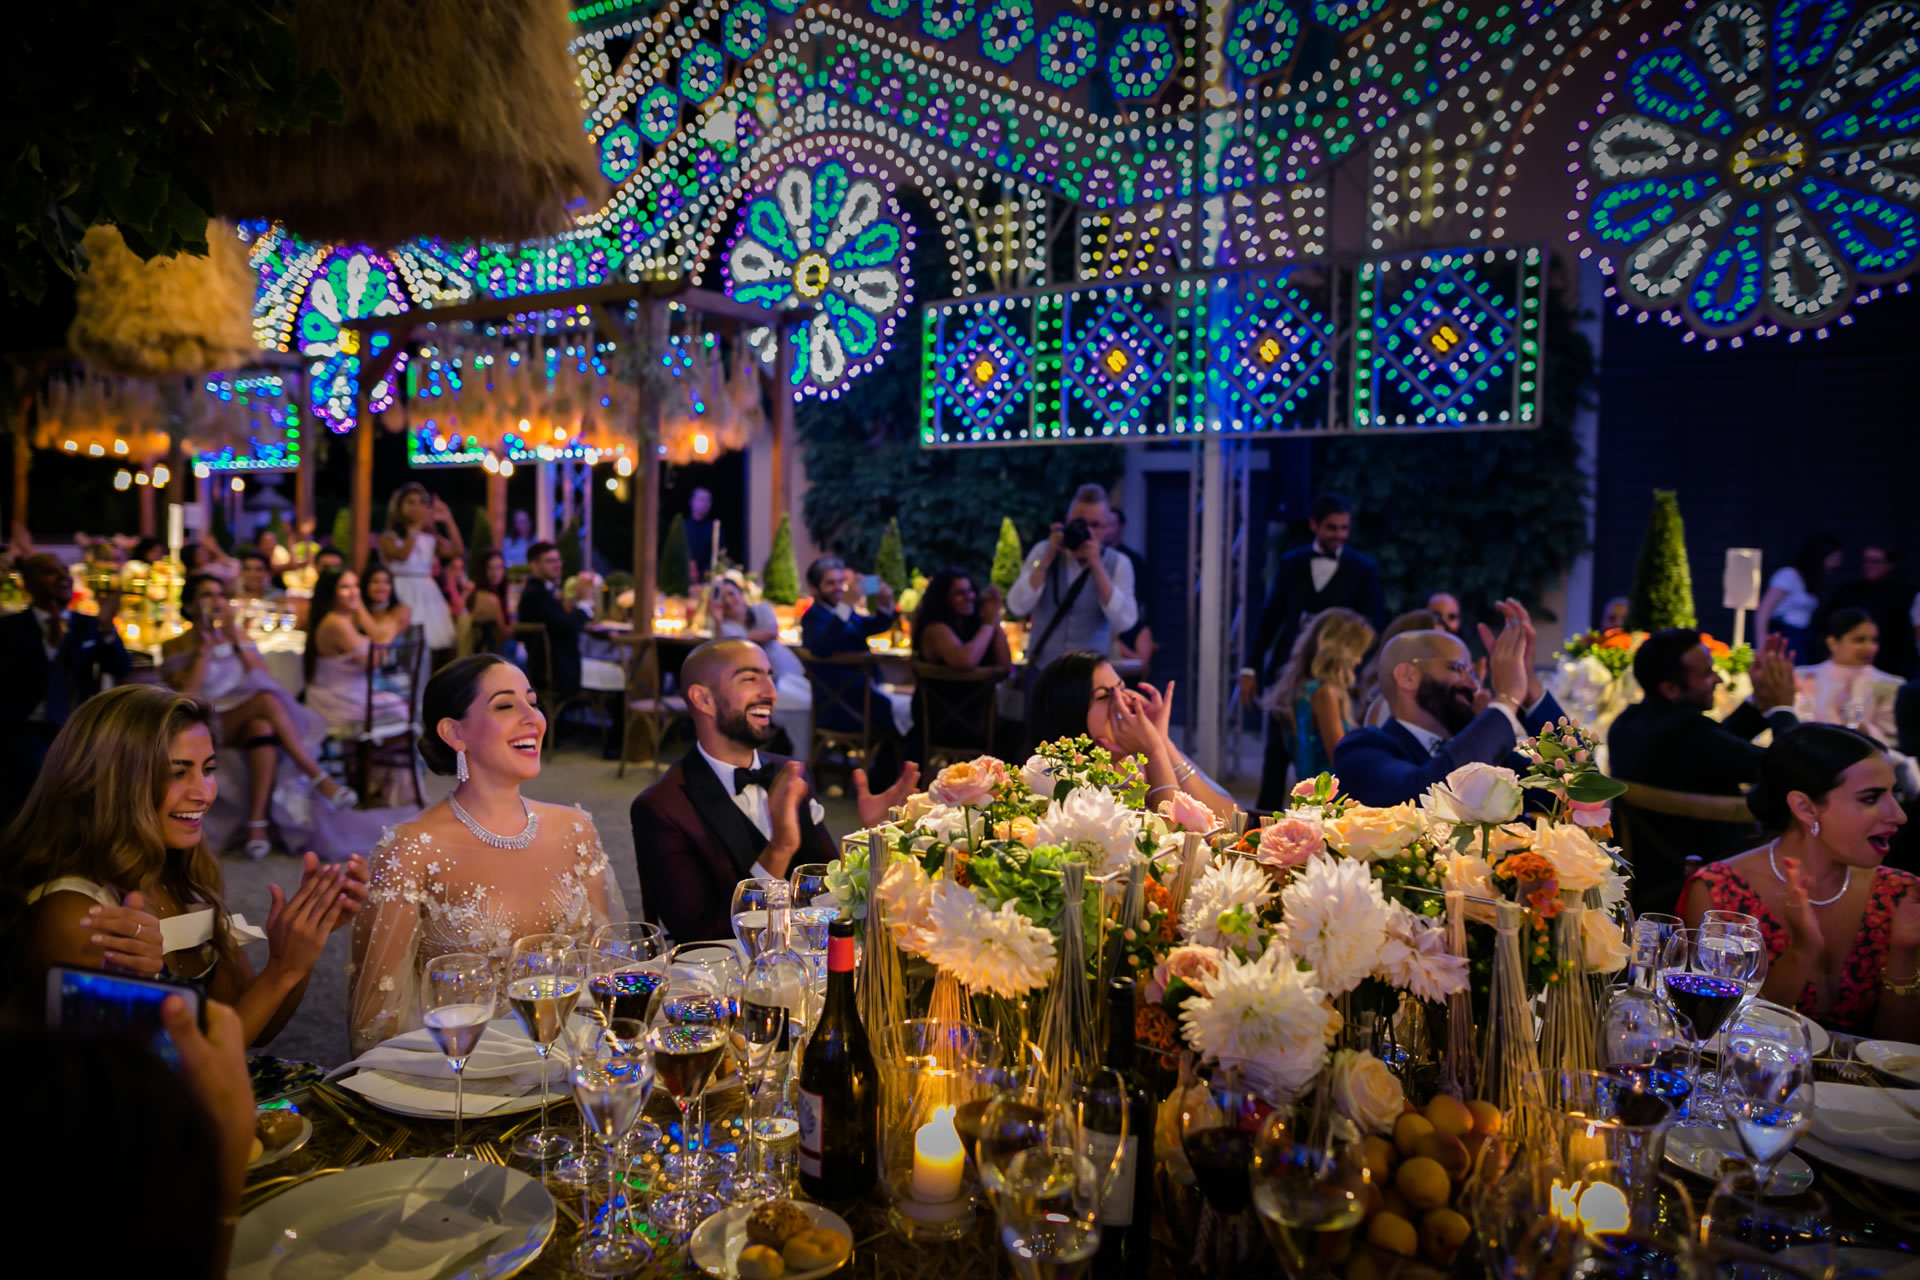 Dinner - 54 :: Luxury wedding at Il Borro :: Luxury wedding photography - 53 :: Dinner - 54